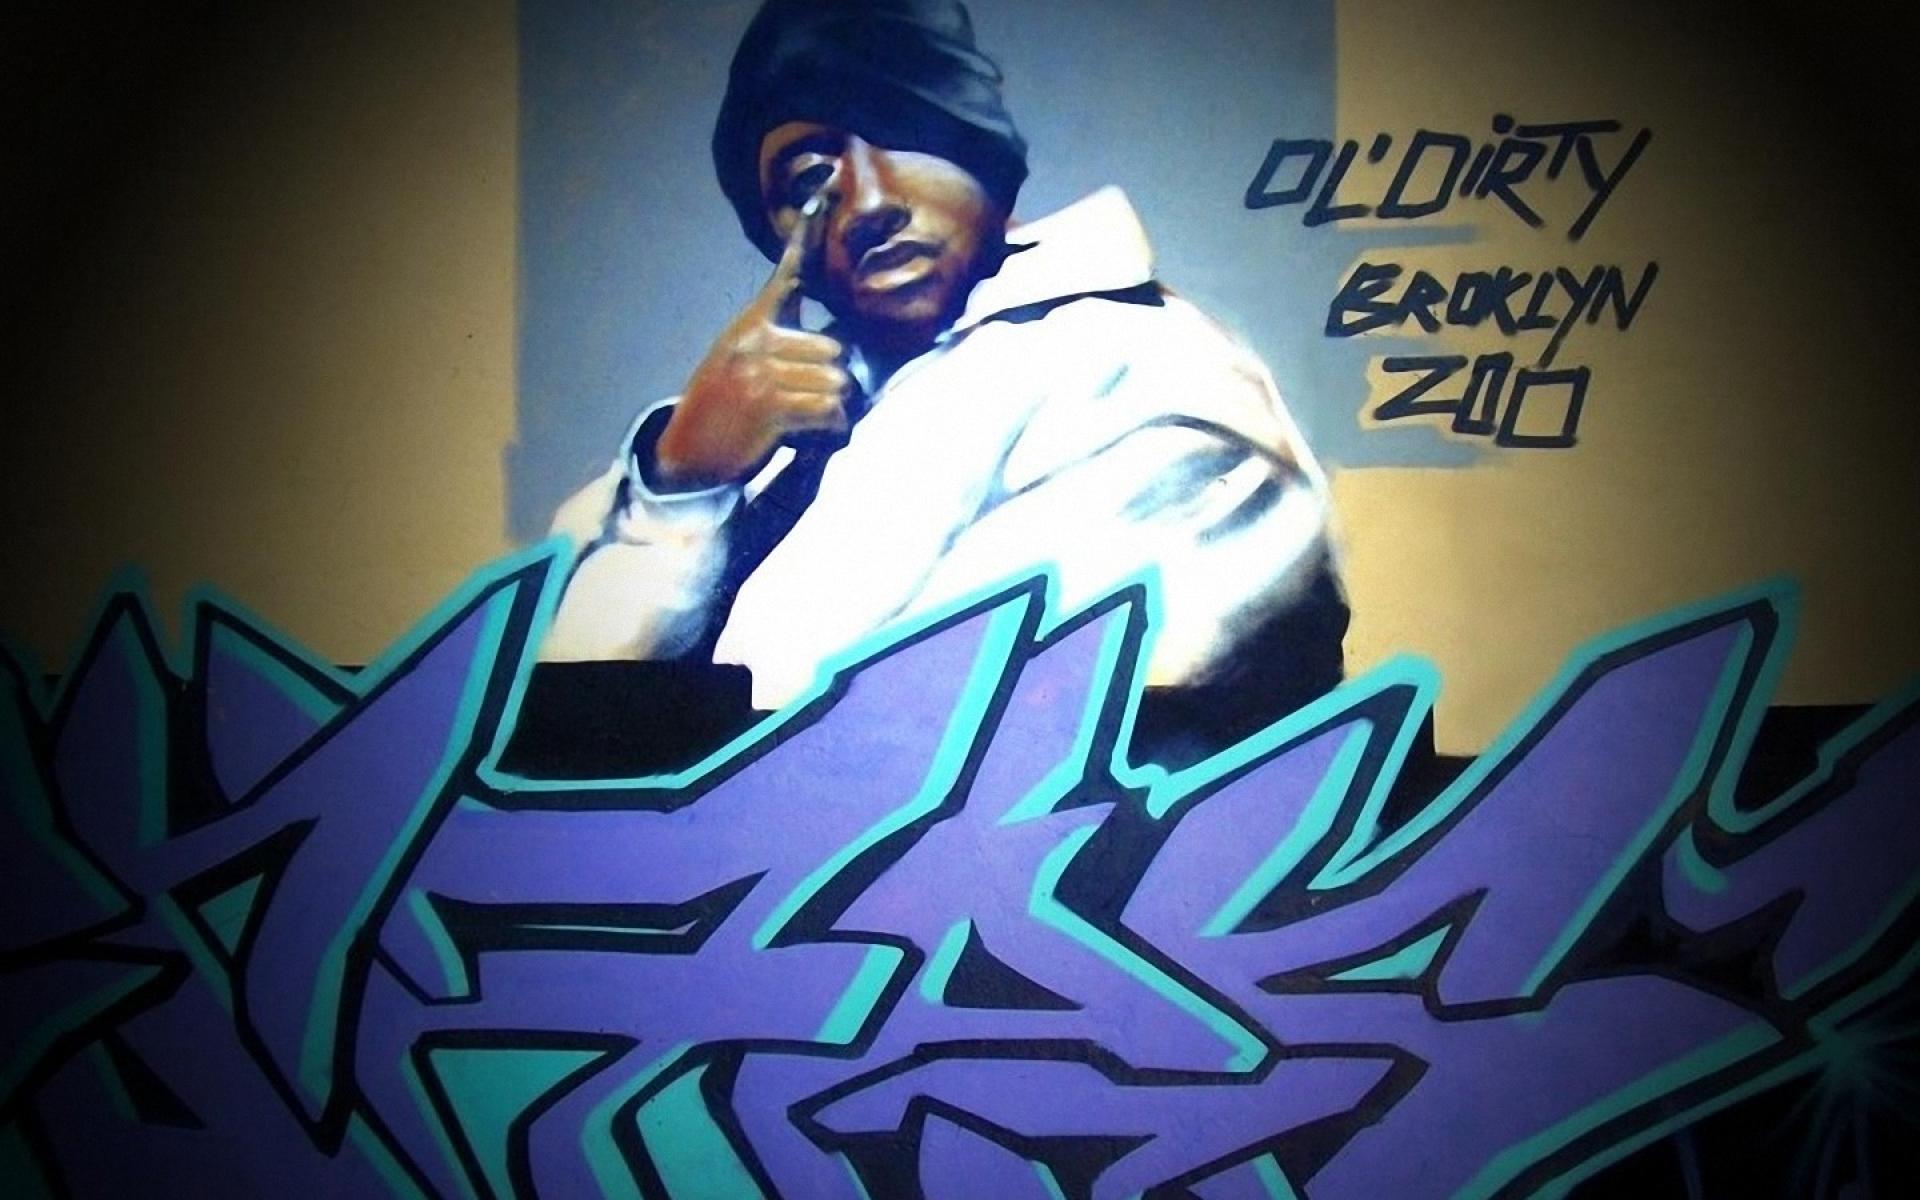 Iphone X Fortnite Wallpapers Cool Graffiti Wallpapers Wallpaper Cave